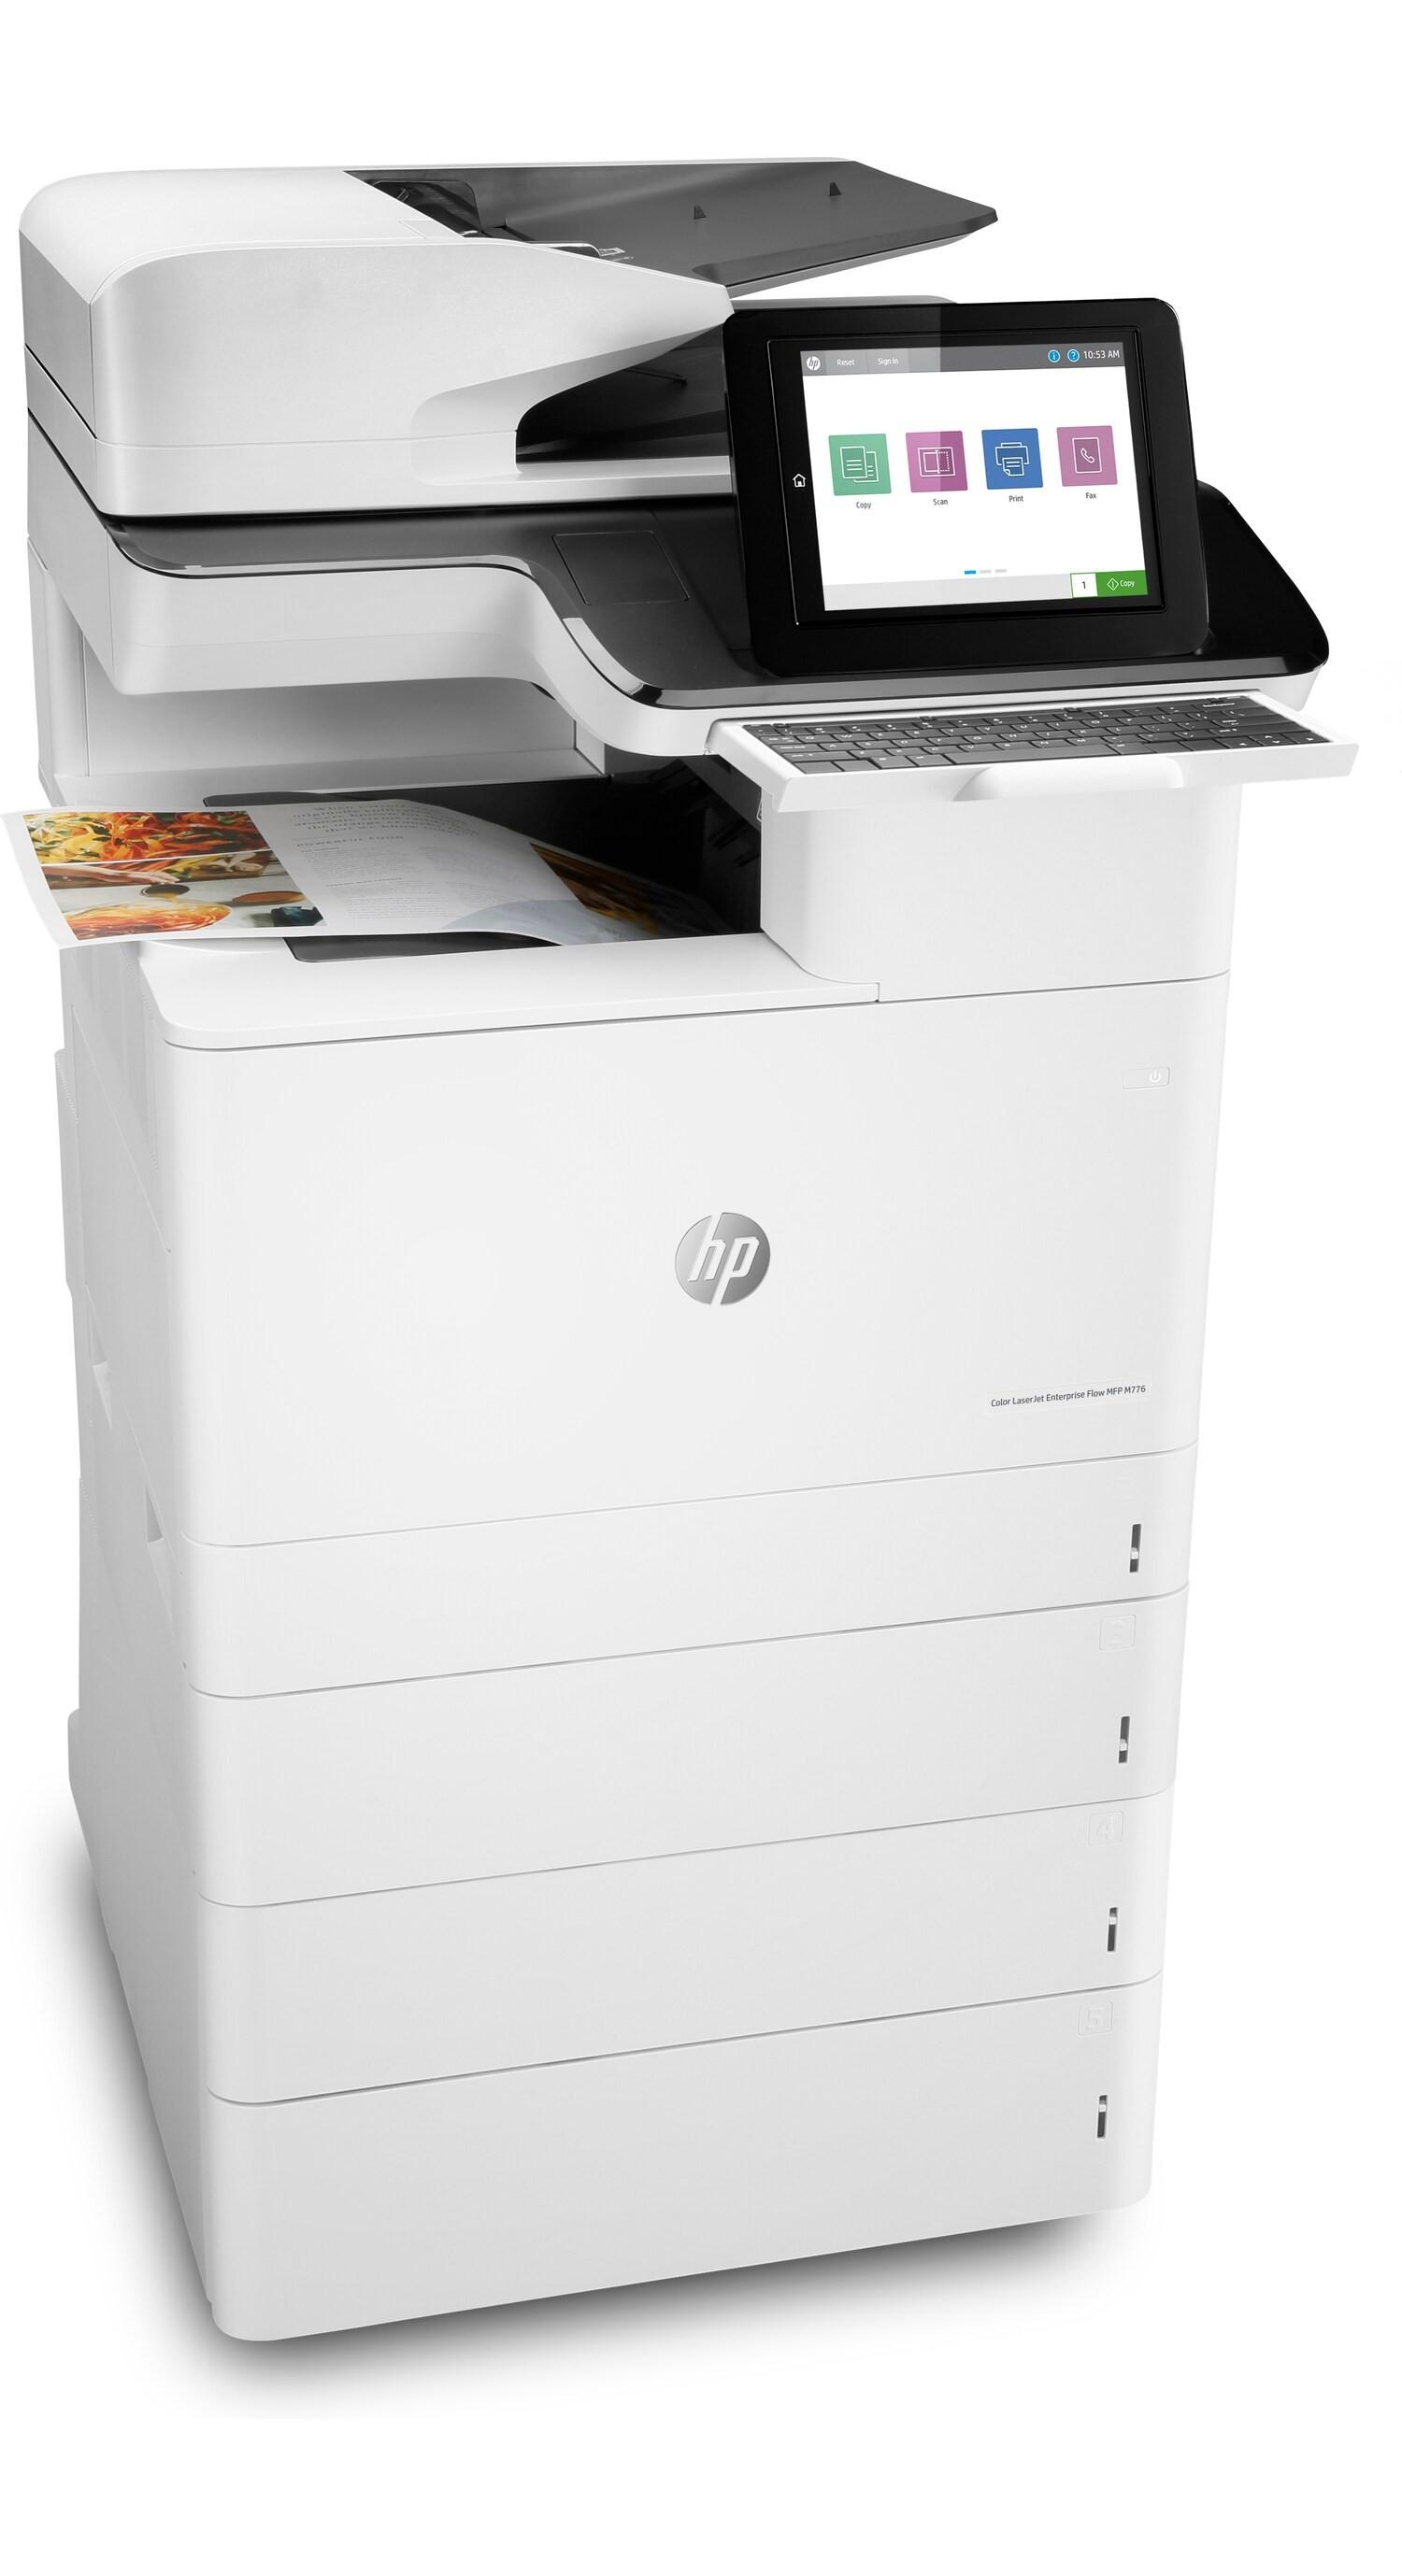 HP LaserJet M776Z A3, színes, lézer multifunkciós nyomtató hálózatos, Wi-Fi-s, duplex